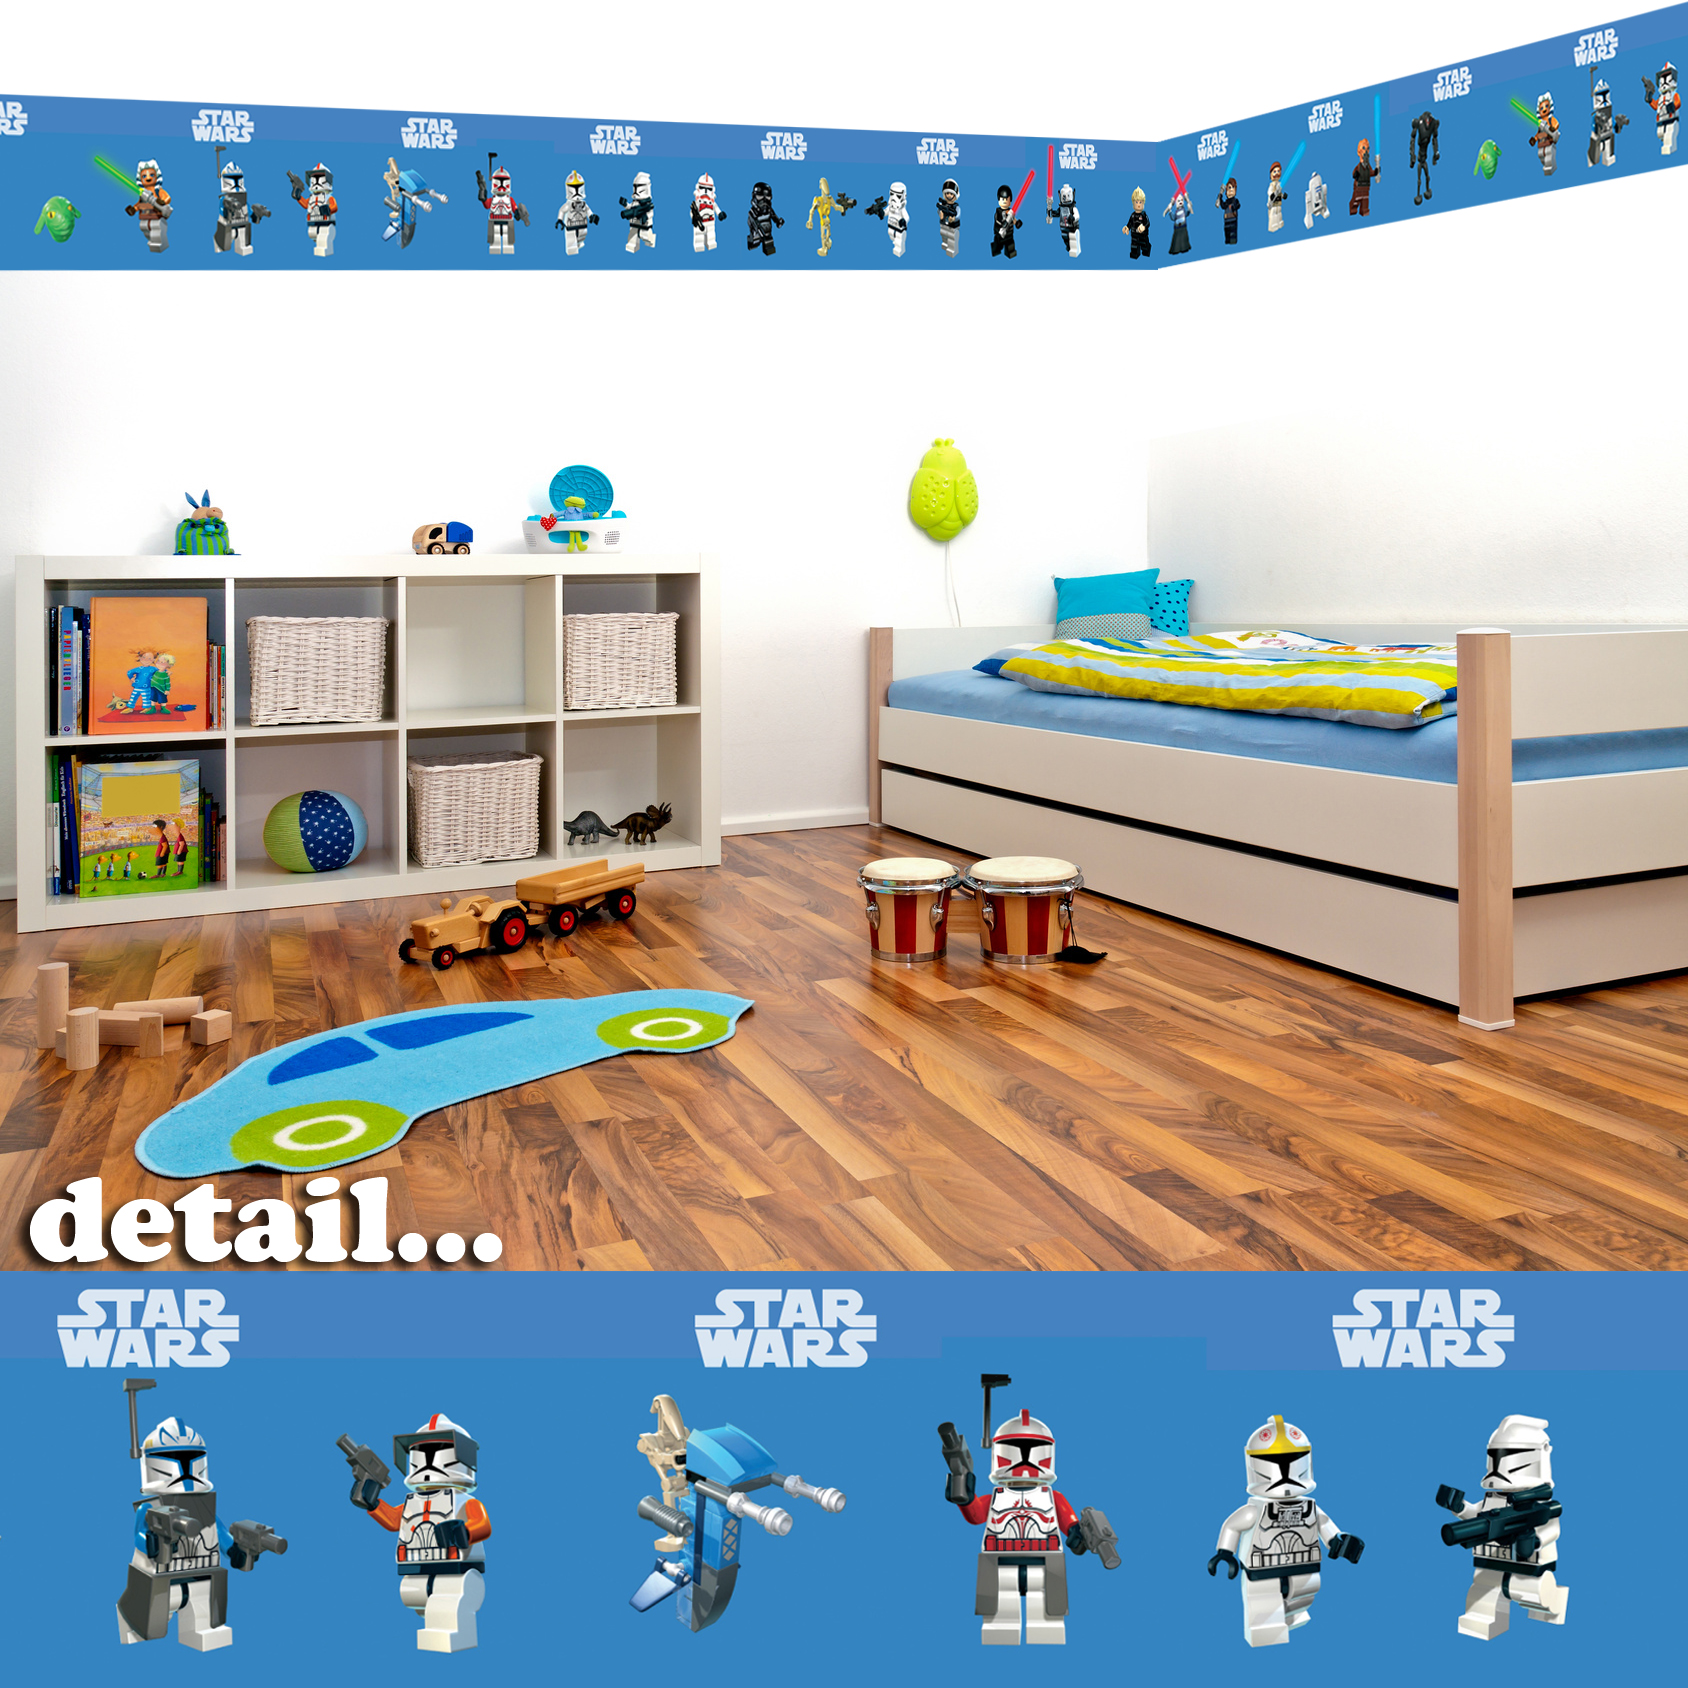 48 Lego Star Wars Wallpaper Border On Wallpapersafari